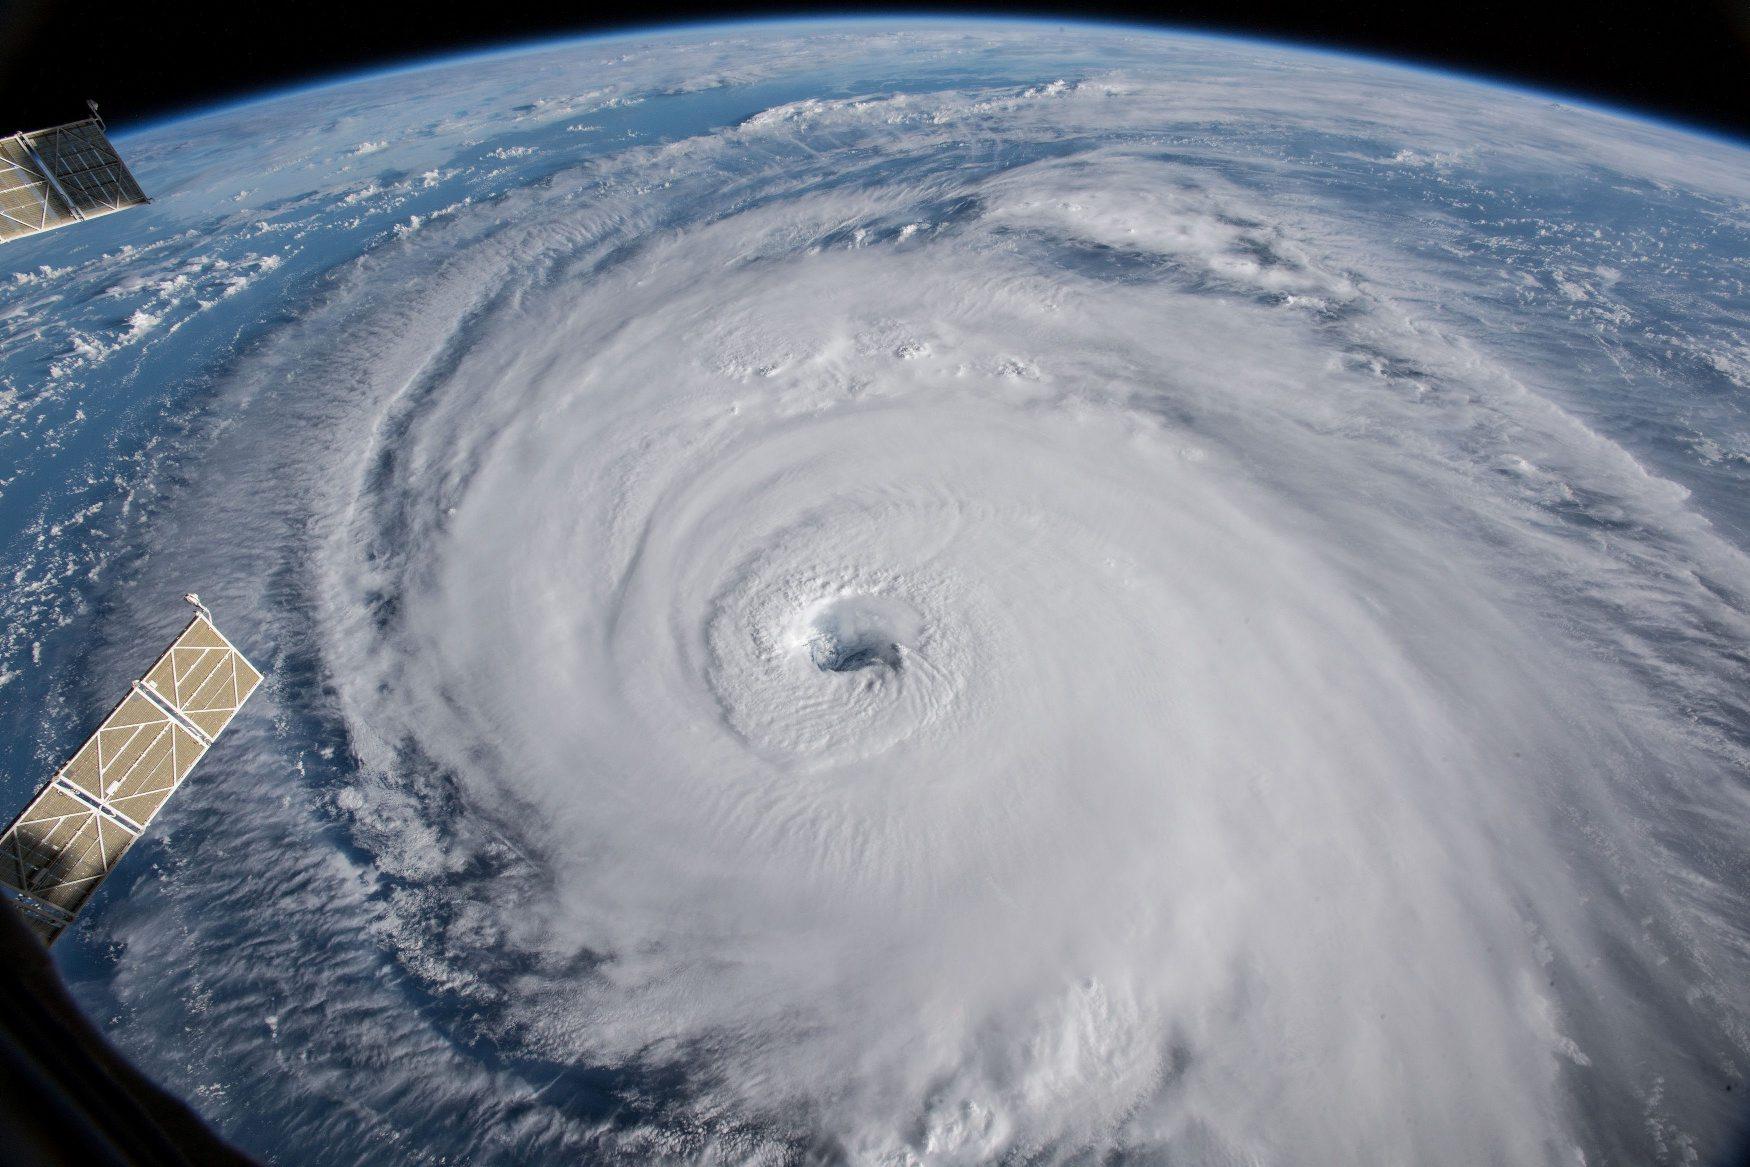 uragan Florence snimljen iz Međunarodne svemirske stanice